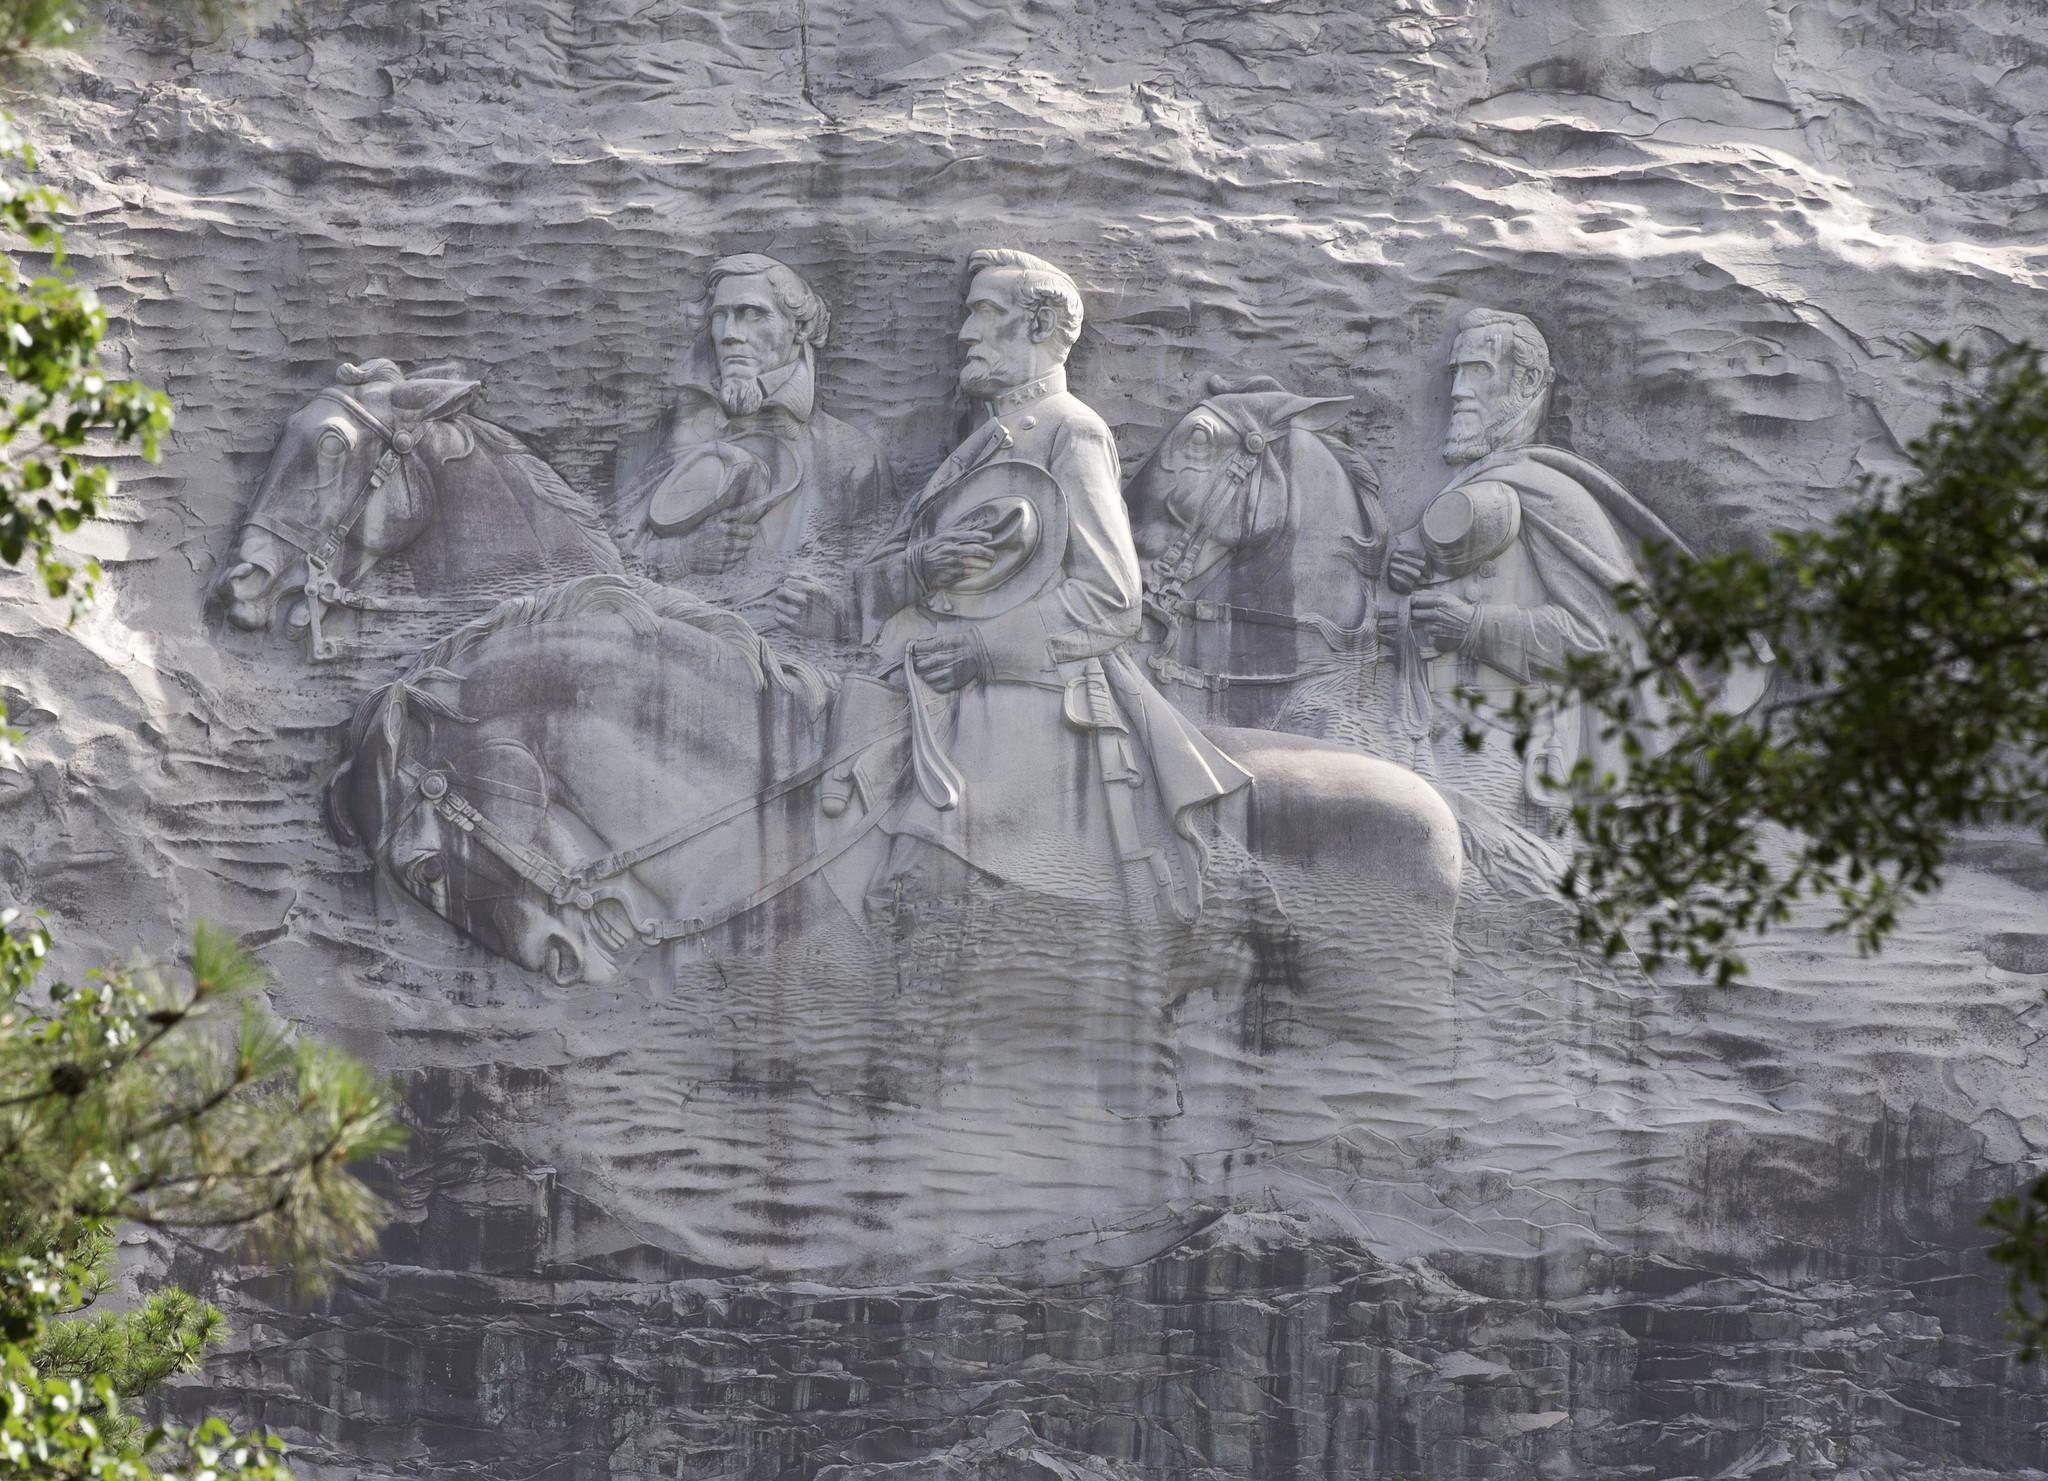 Georgia debates mountainside carving dedicated to